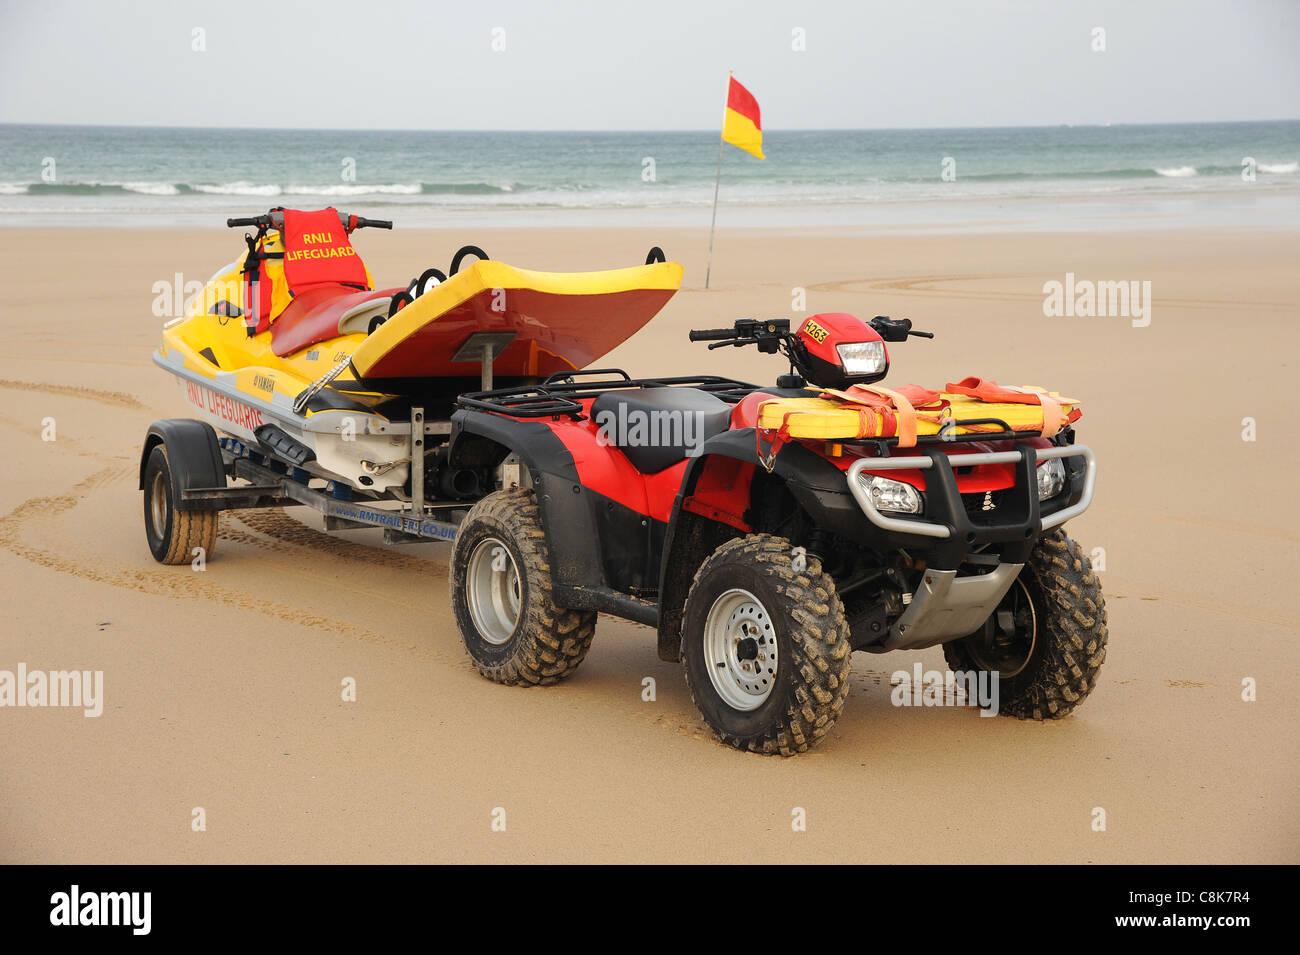 Cornwall, England.  An RNLI lifeguard's quad bike and jet ski PWC rescue craft on a sandy beach. - Stock Image